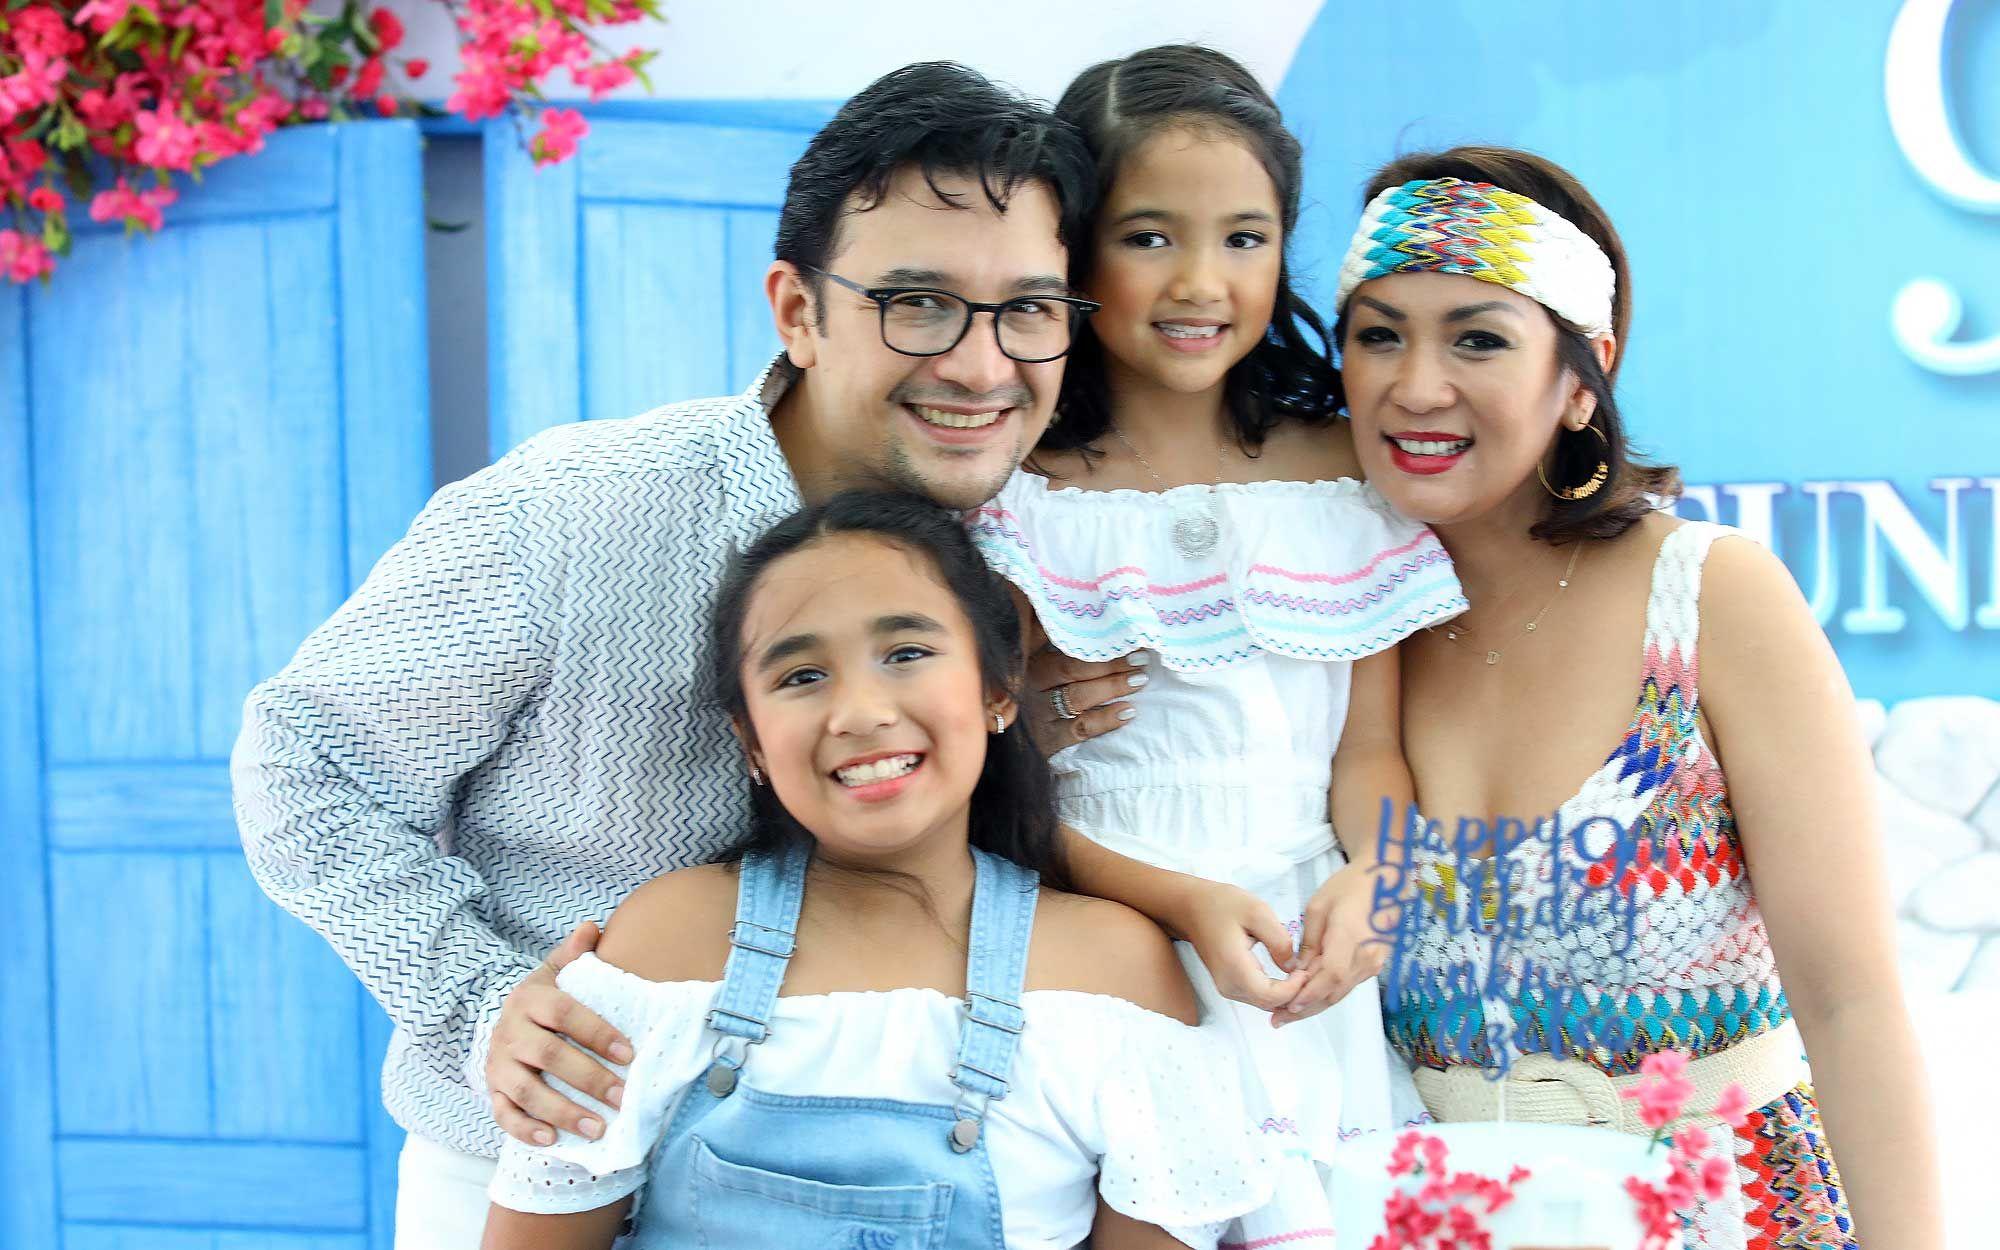 Tunku Mohamed Alauddin and Puteri Badrinise Zakuan-Naquiyuddin with Tunku Alaynna Puteri and Tunku Azalea Puteri